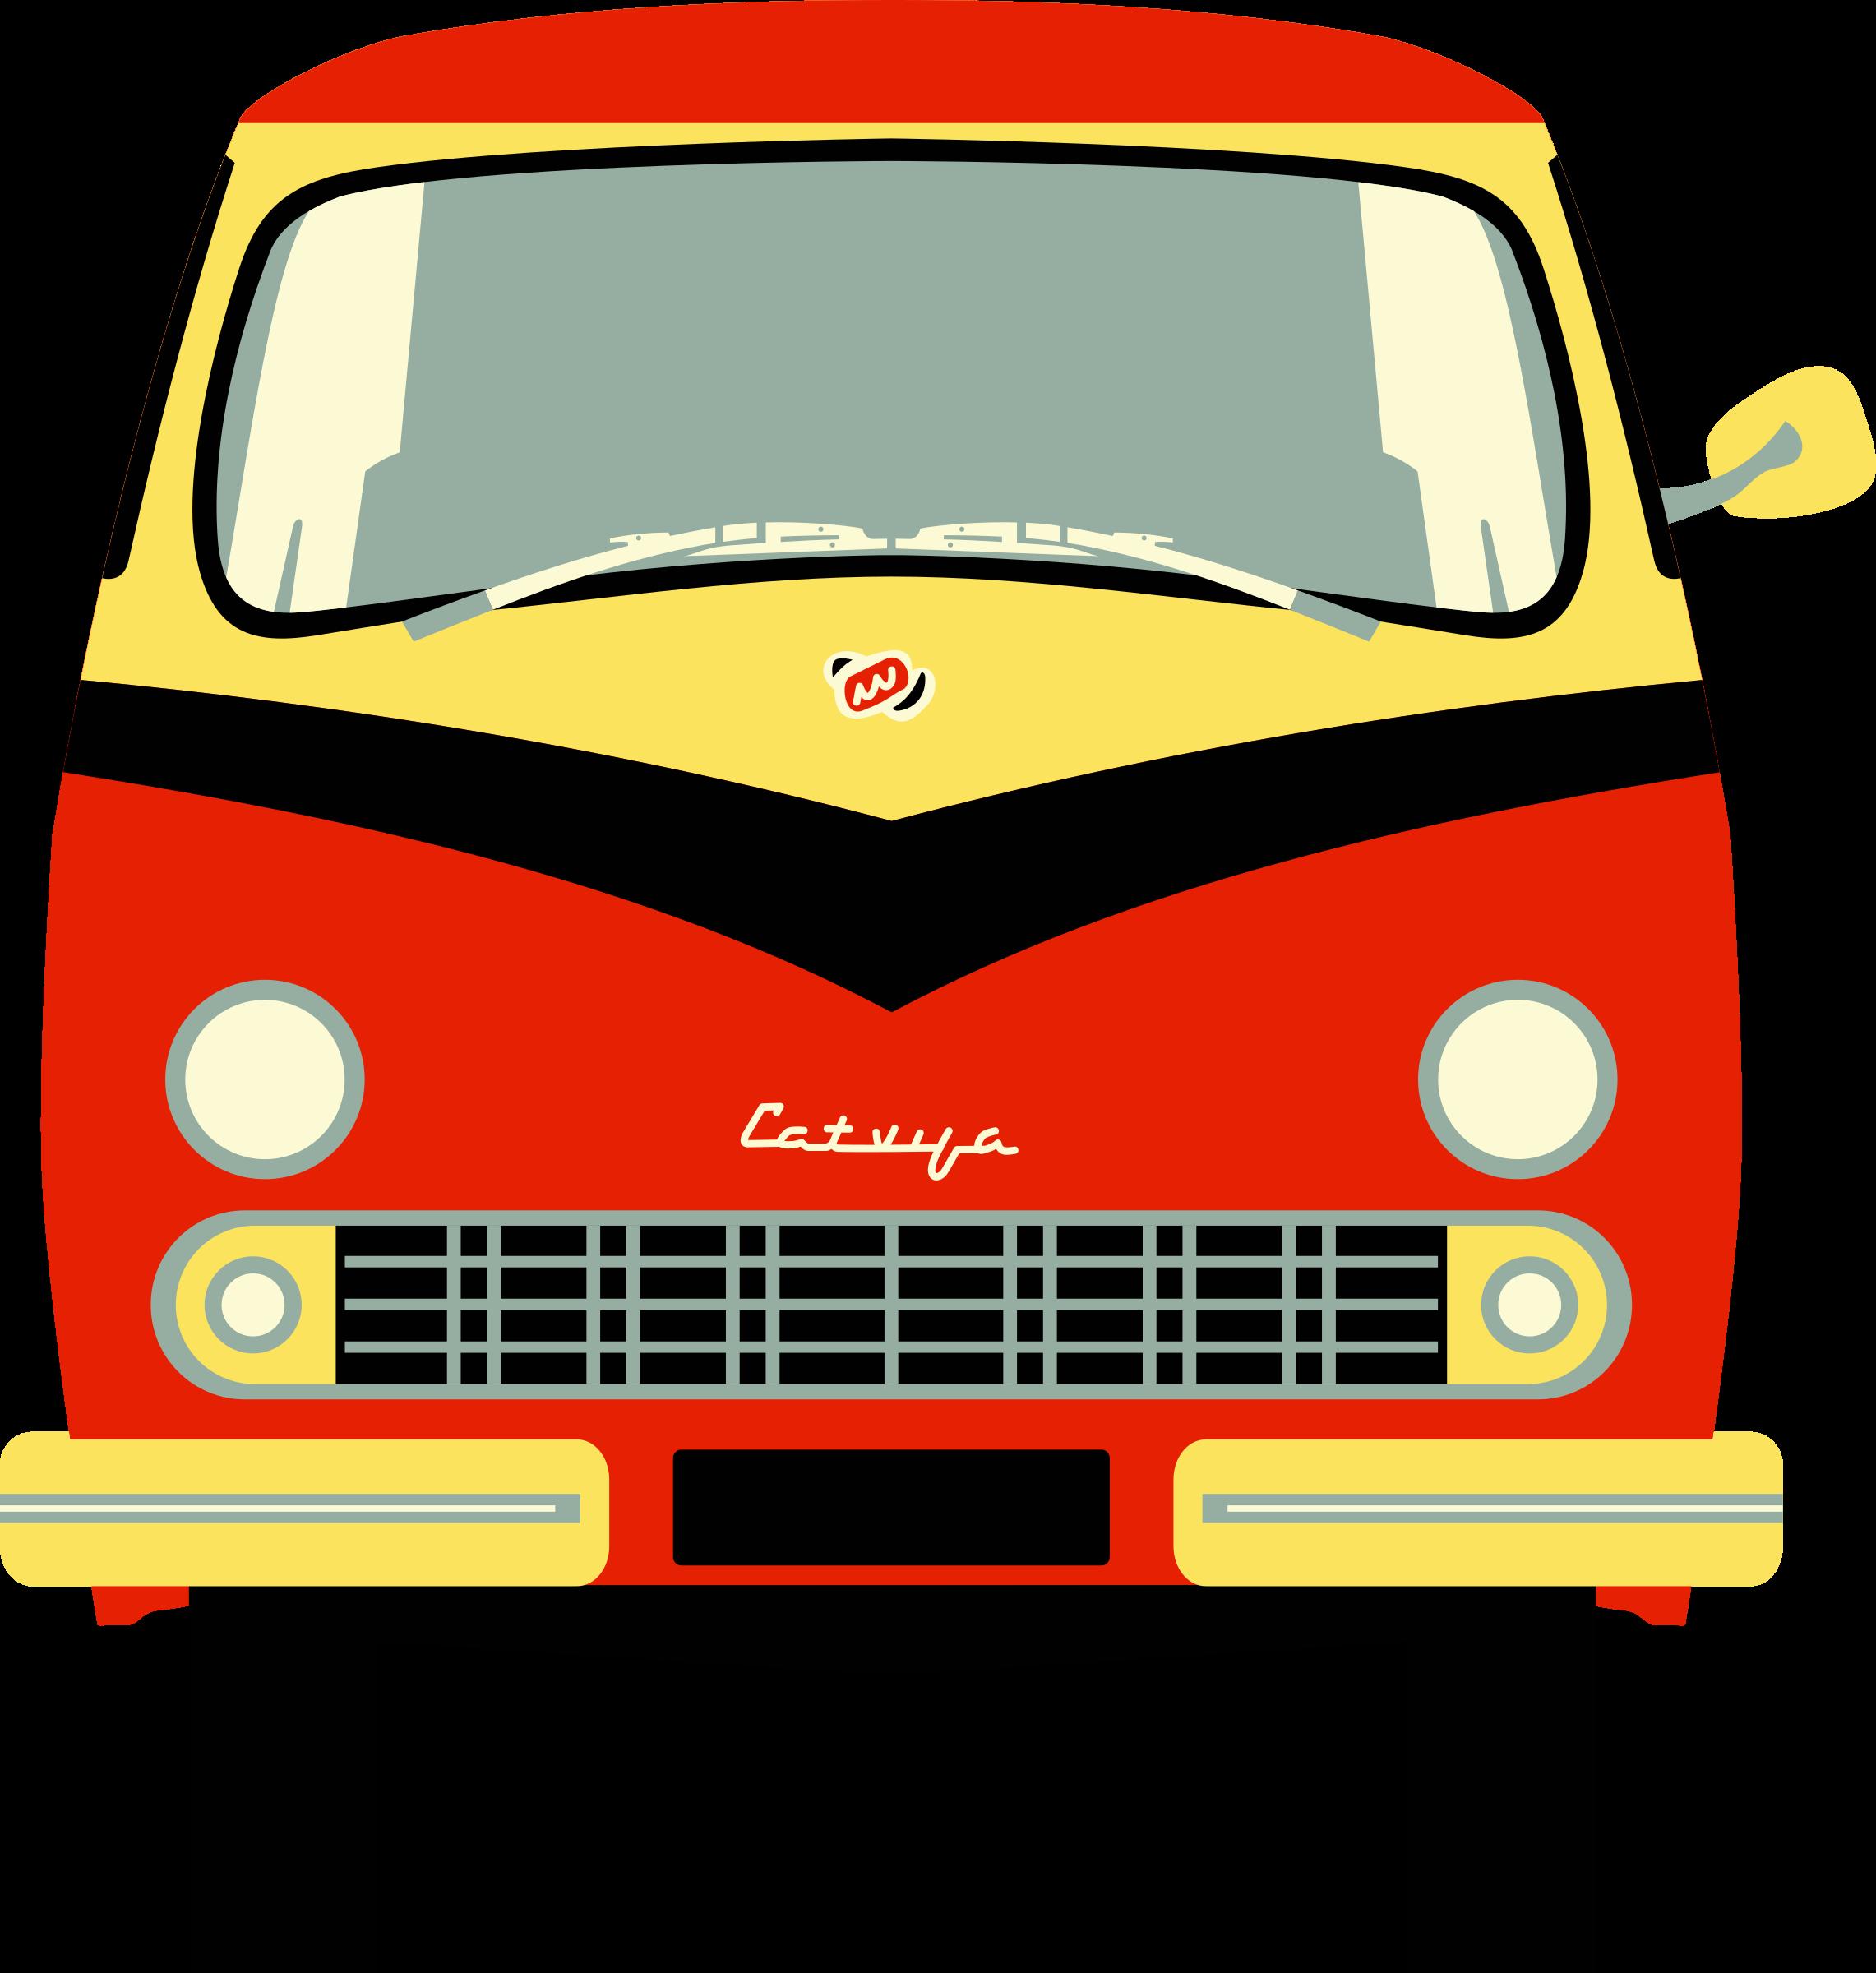 transparent download Minivan drawing. Clipart latvija by rones